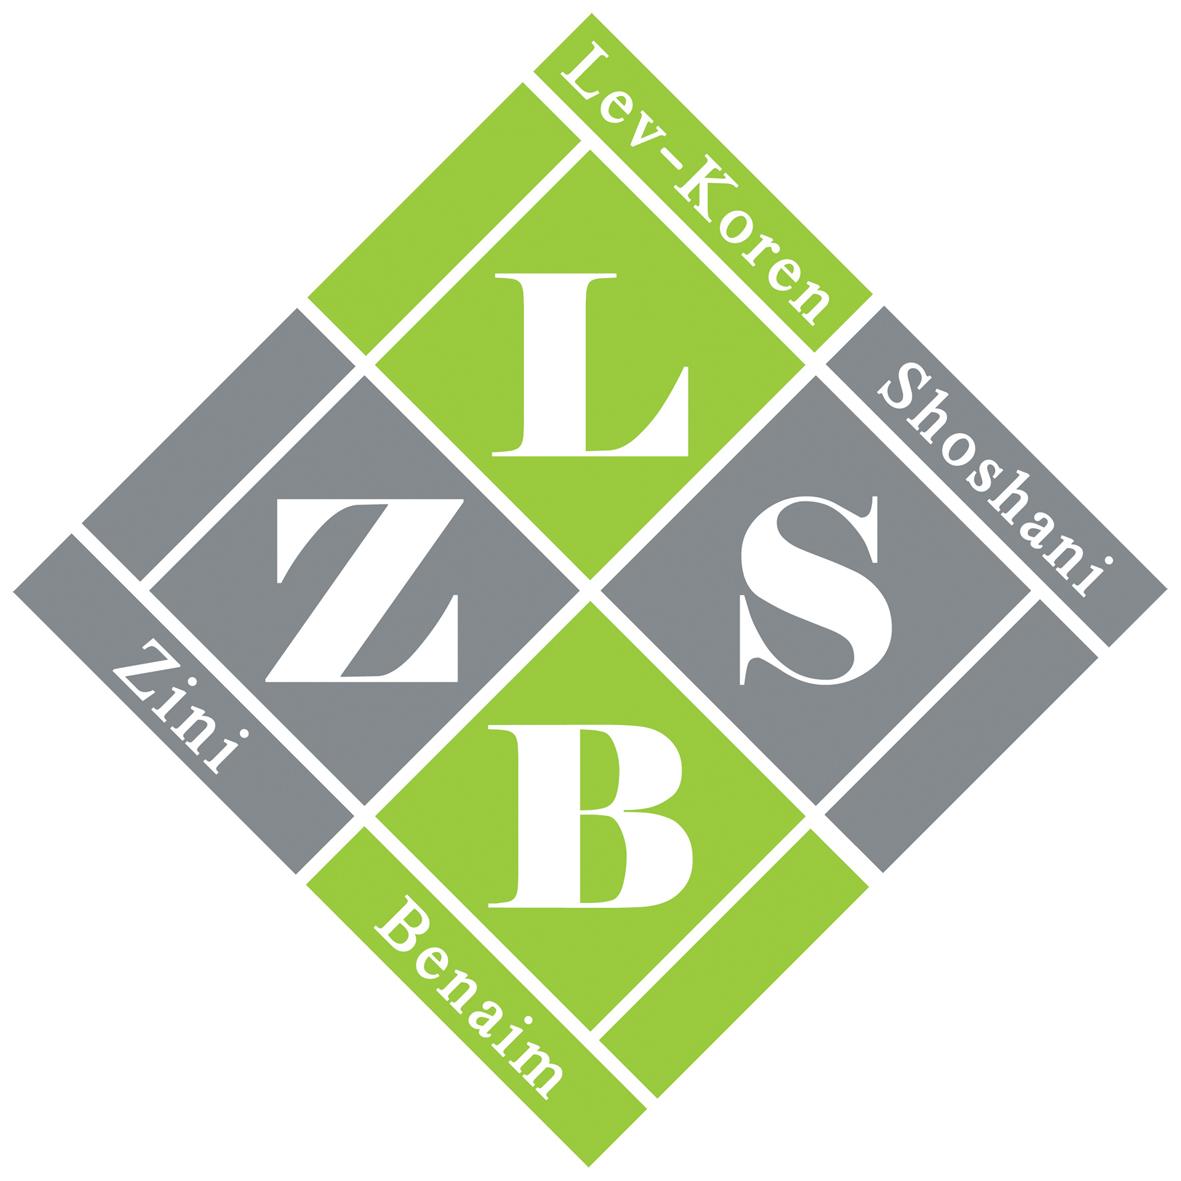 Lev-Koren, Shoshani, Zini, Benaim, Law Office, and Notary